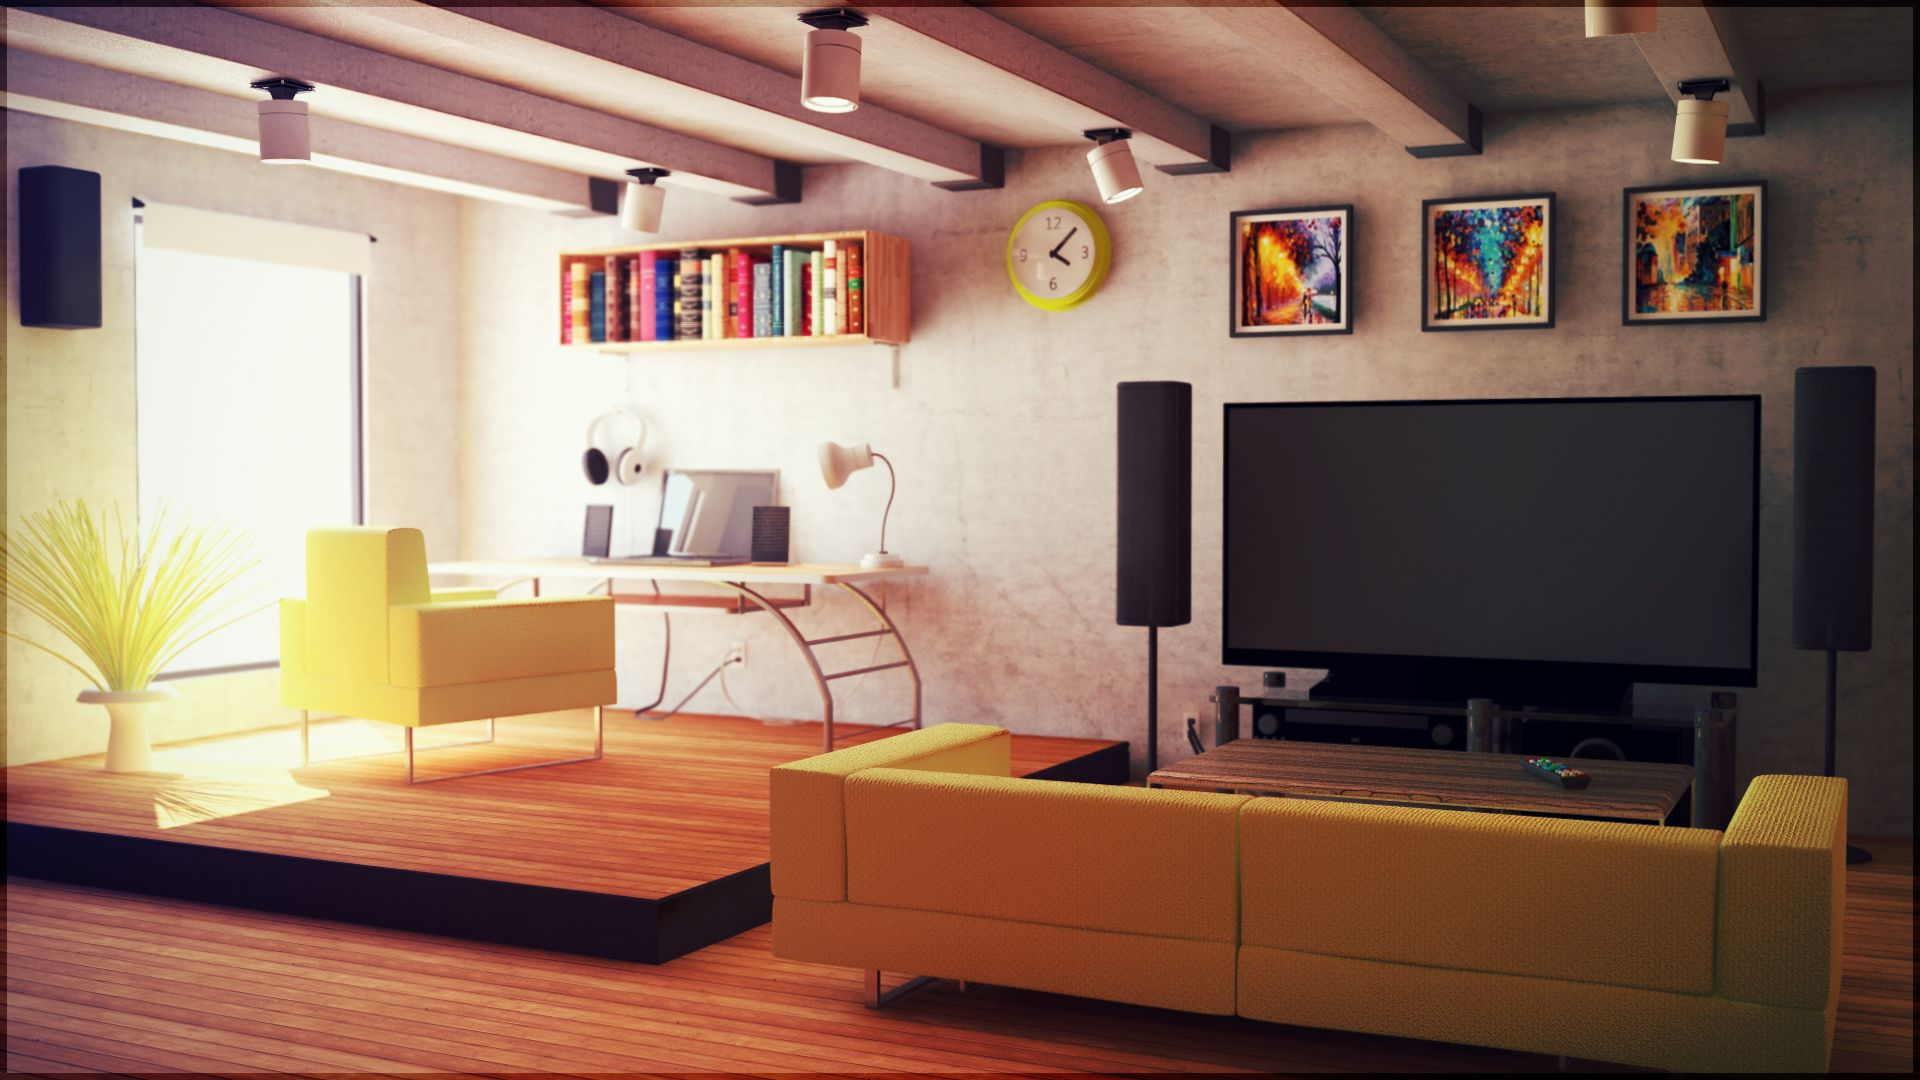 cool studio apartment - Google Search | Home Improvement Shit ...